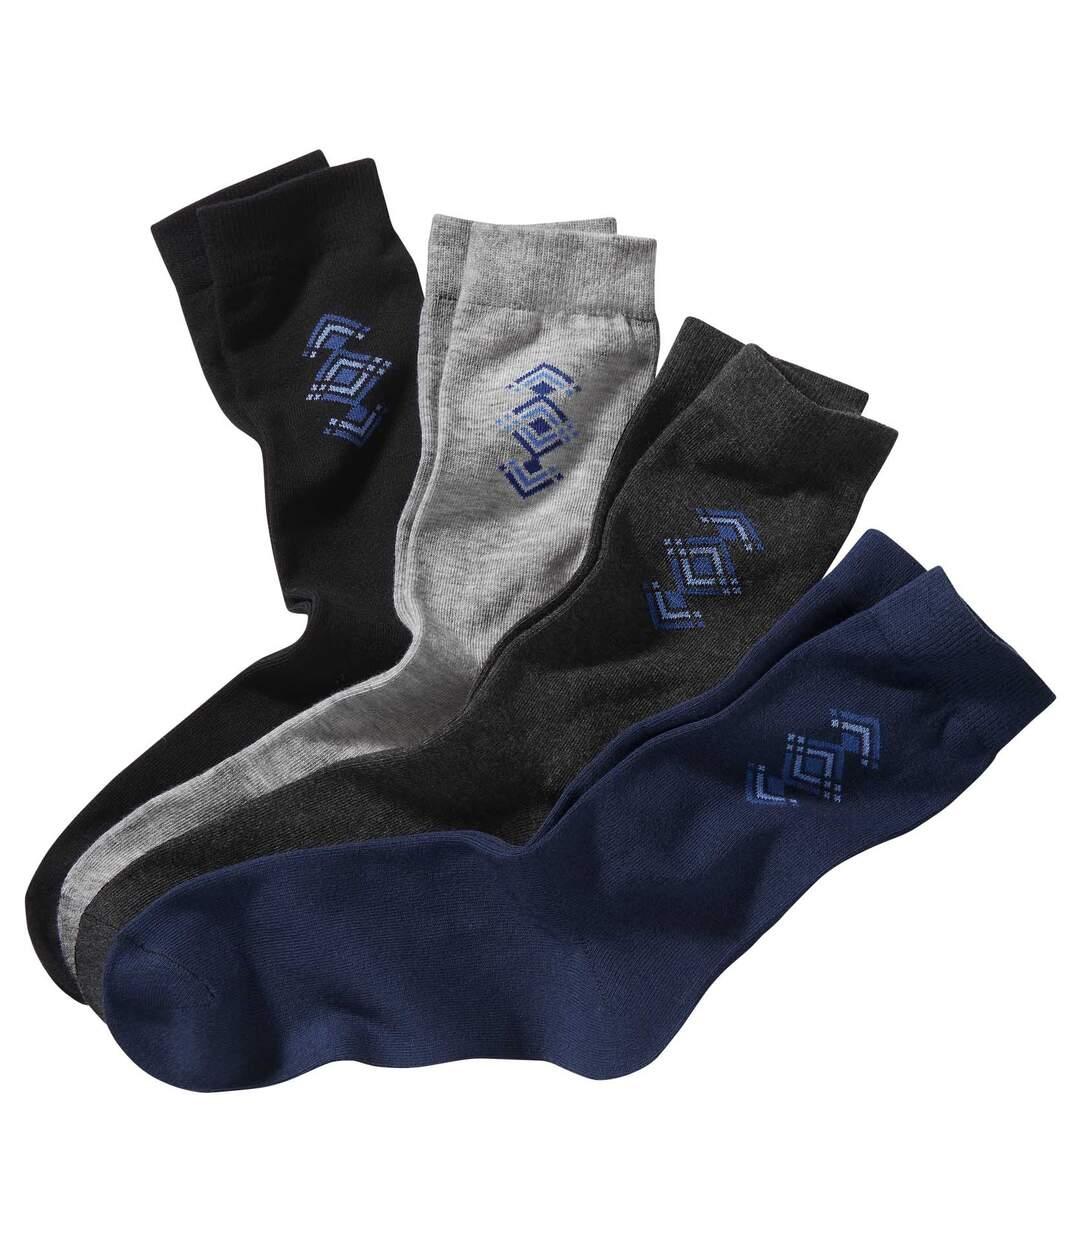 Sada 4 párů ponožek s barevným vzorováním